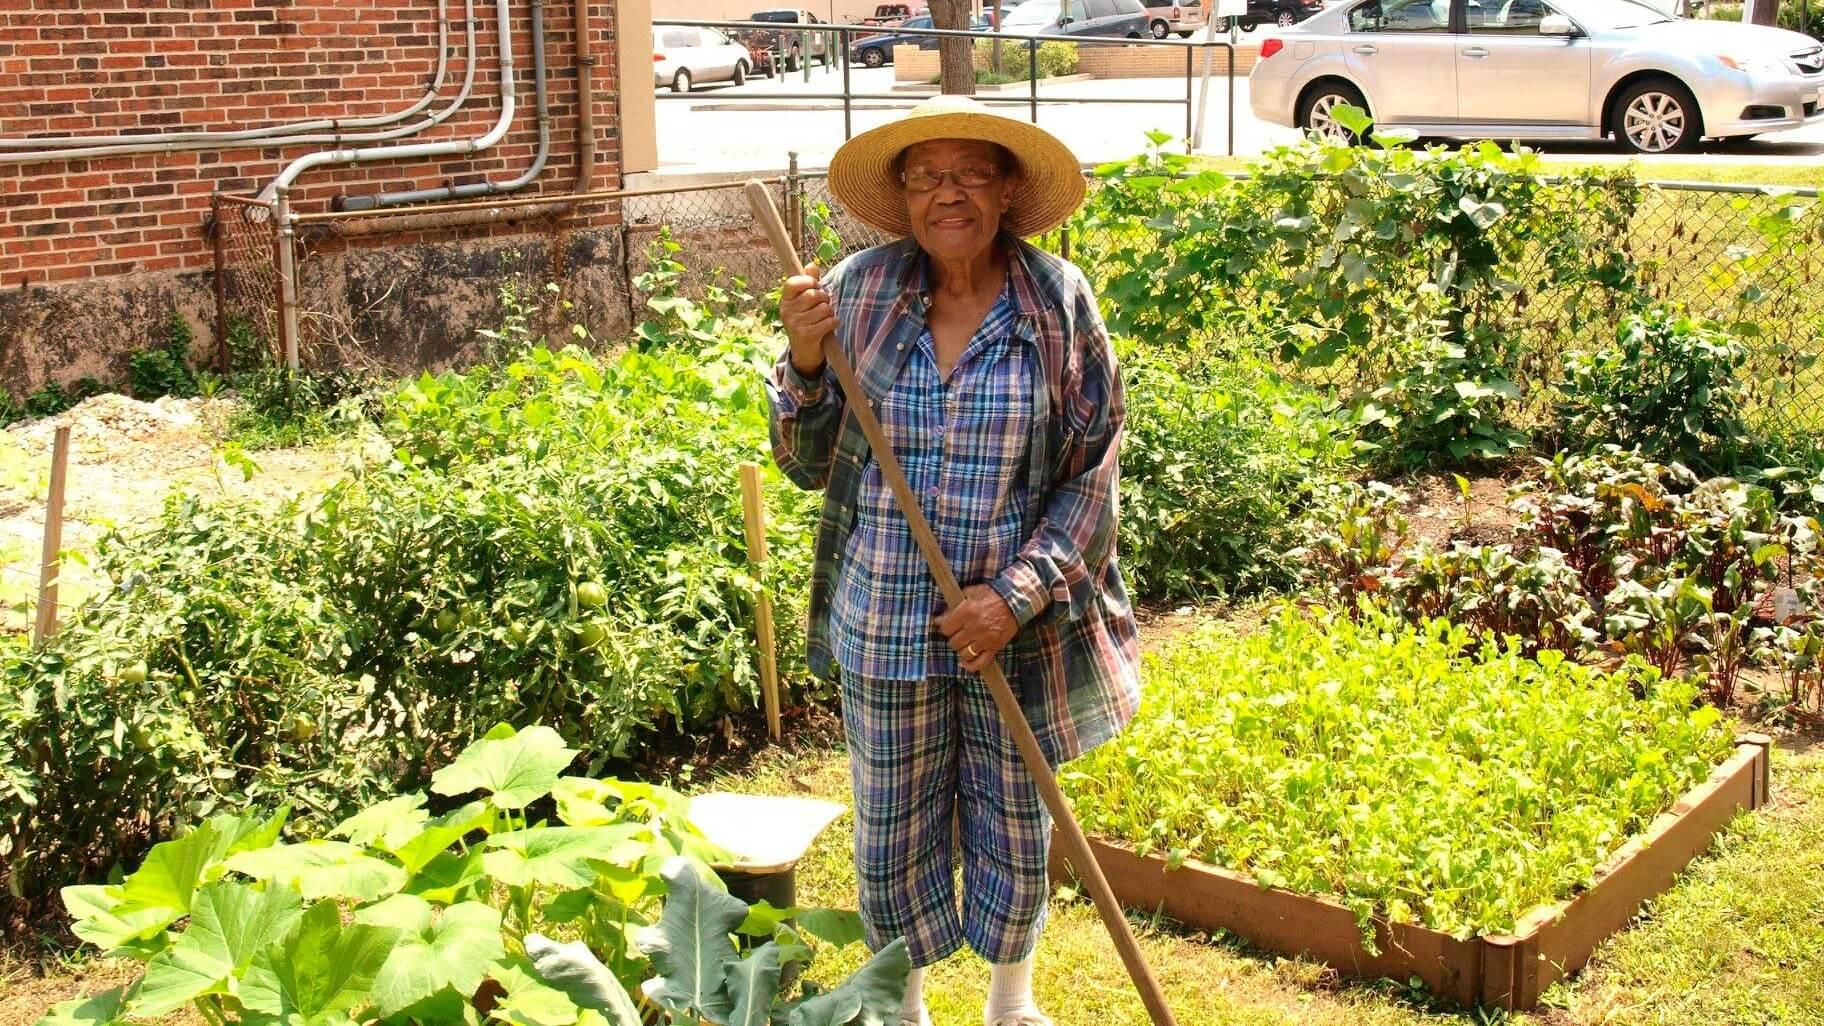 Pastor Grows Vegetables to Help Community Reverse Diabetes